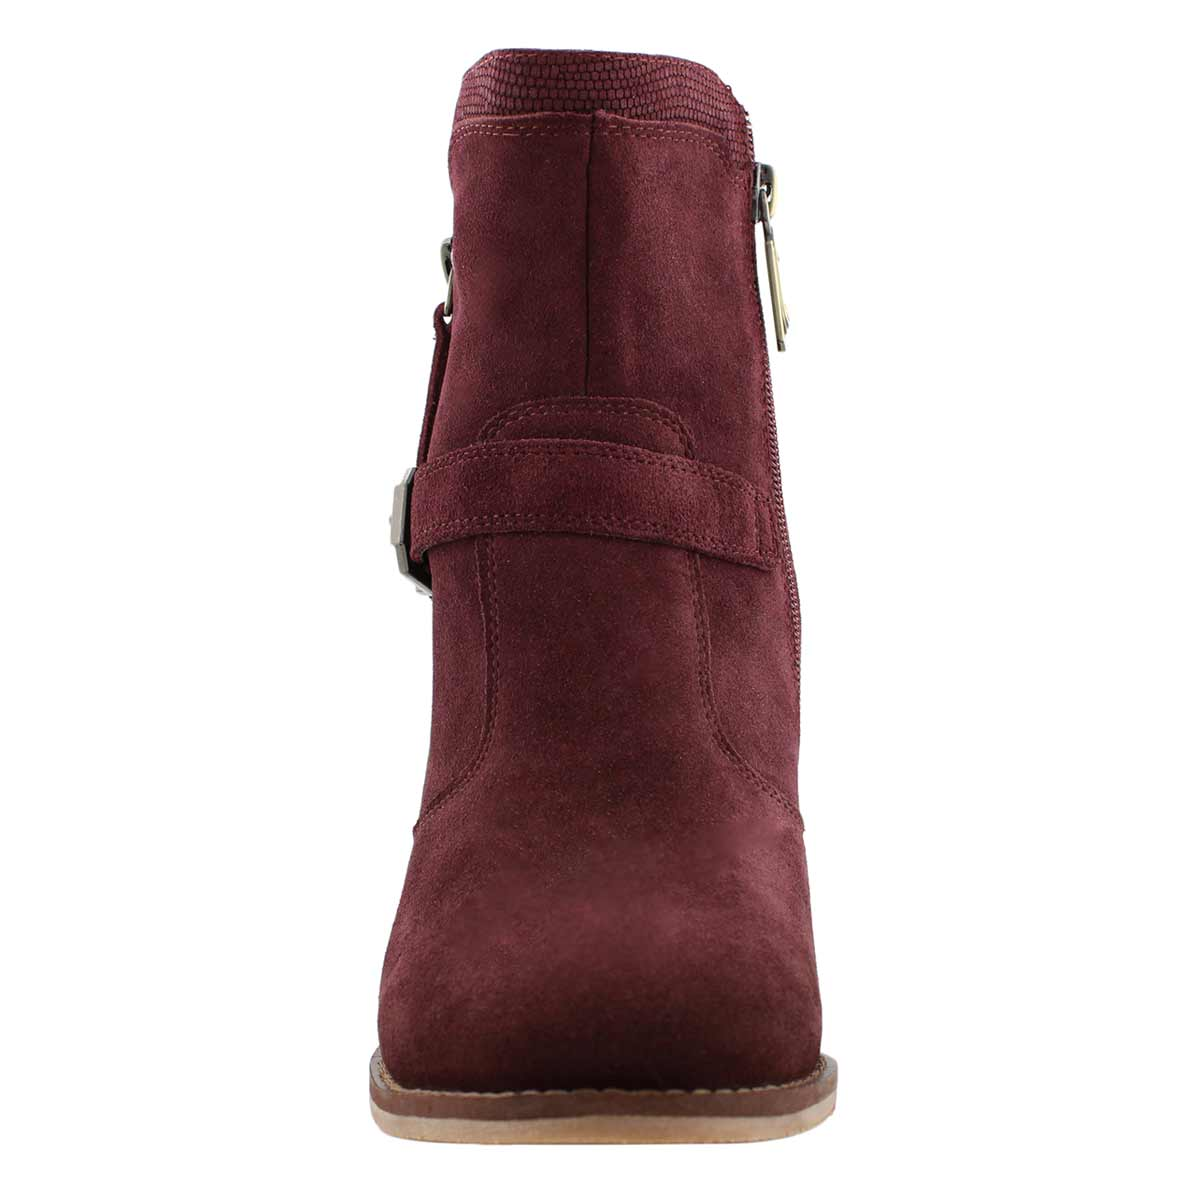 Lds Nova burgundy wtpf zip ankle boot